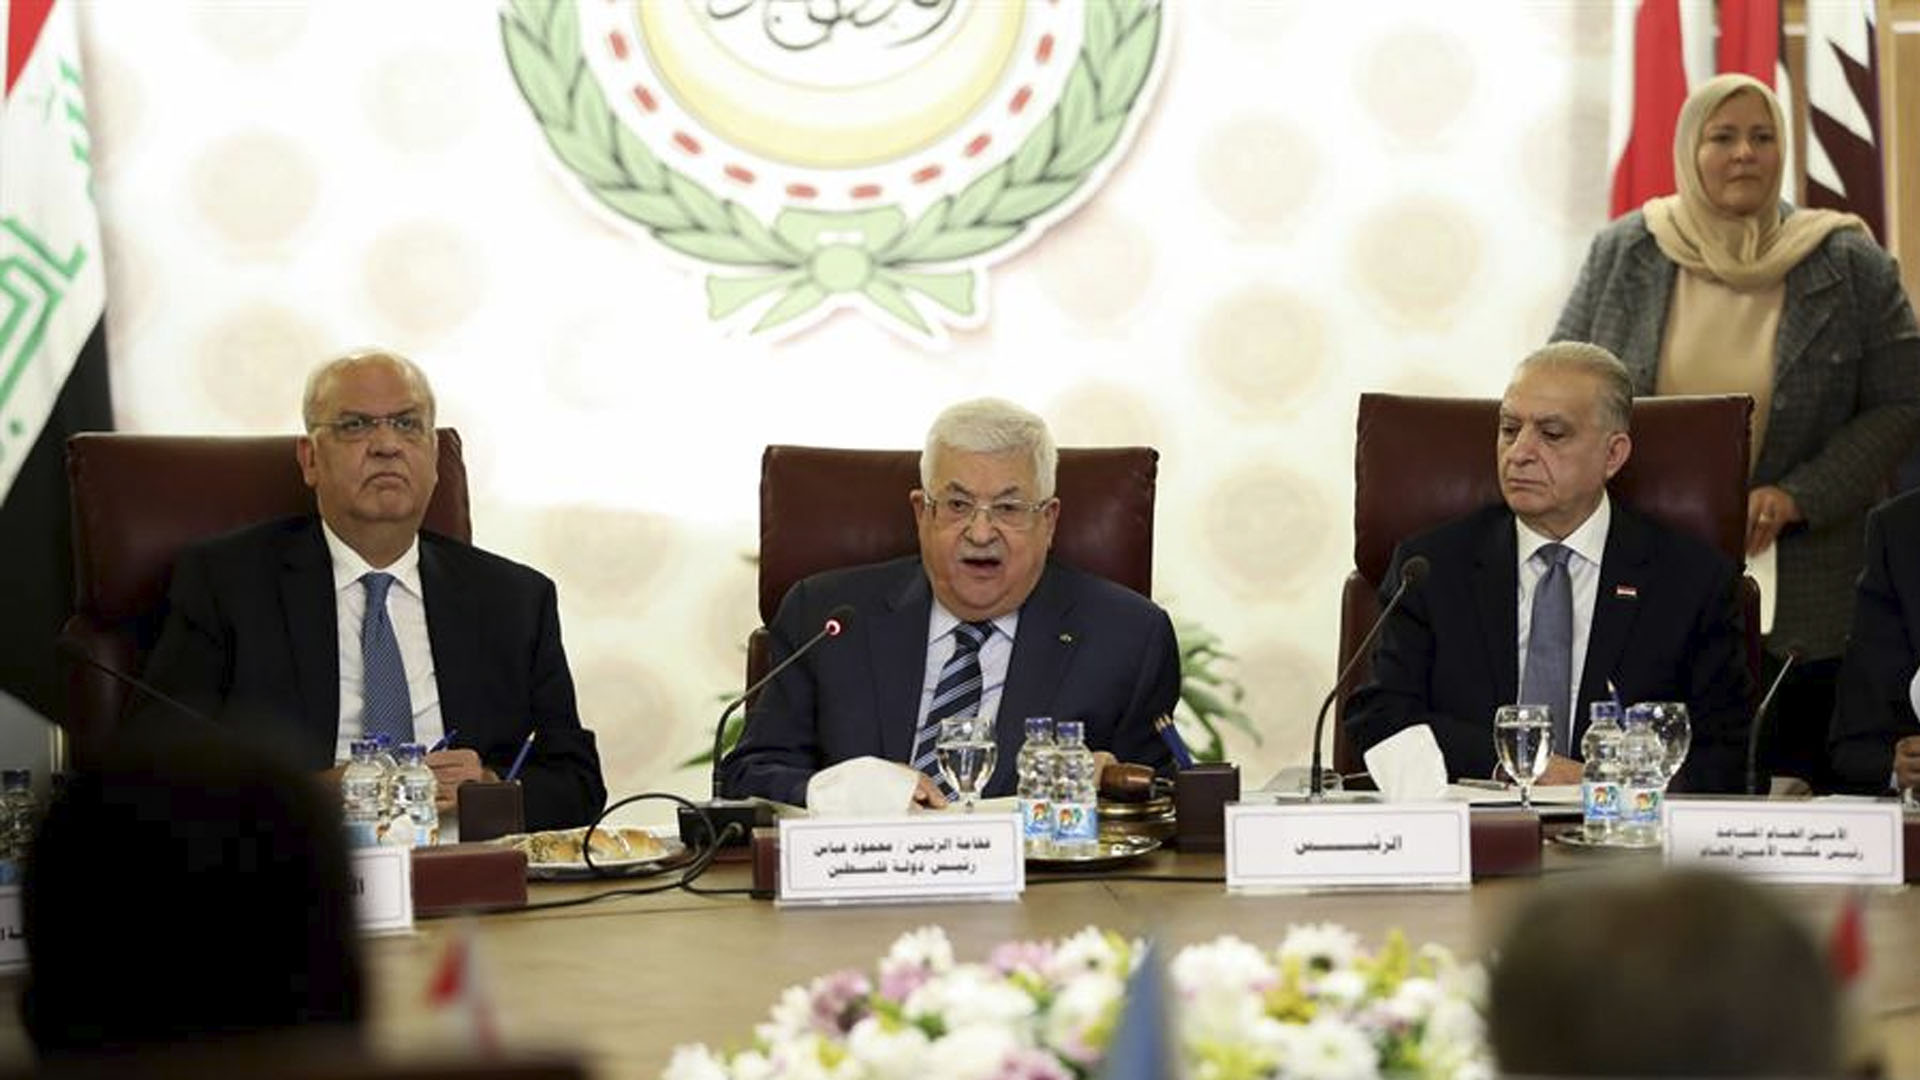 Plan de paz de Trump favorable a Israel recibe rotundo rechazo palestino